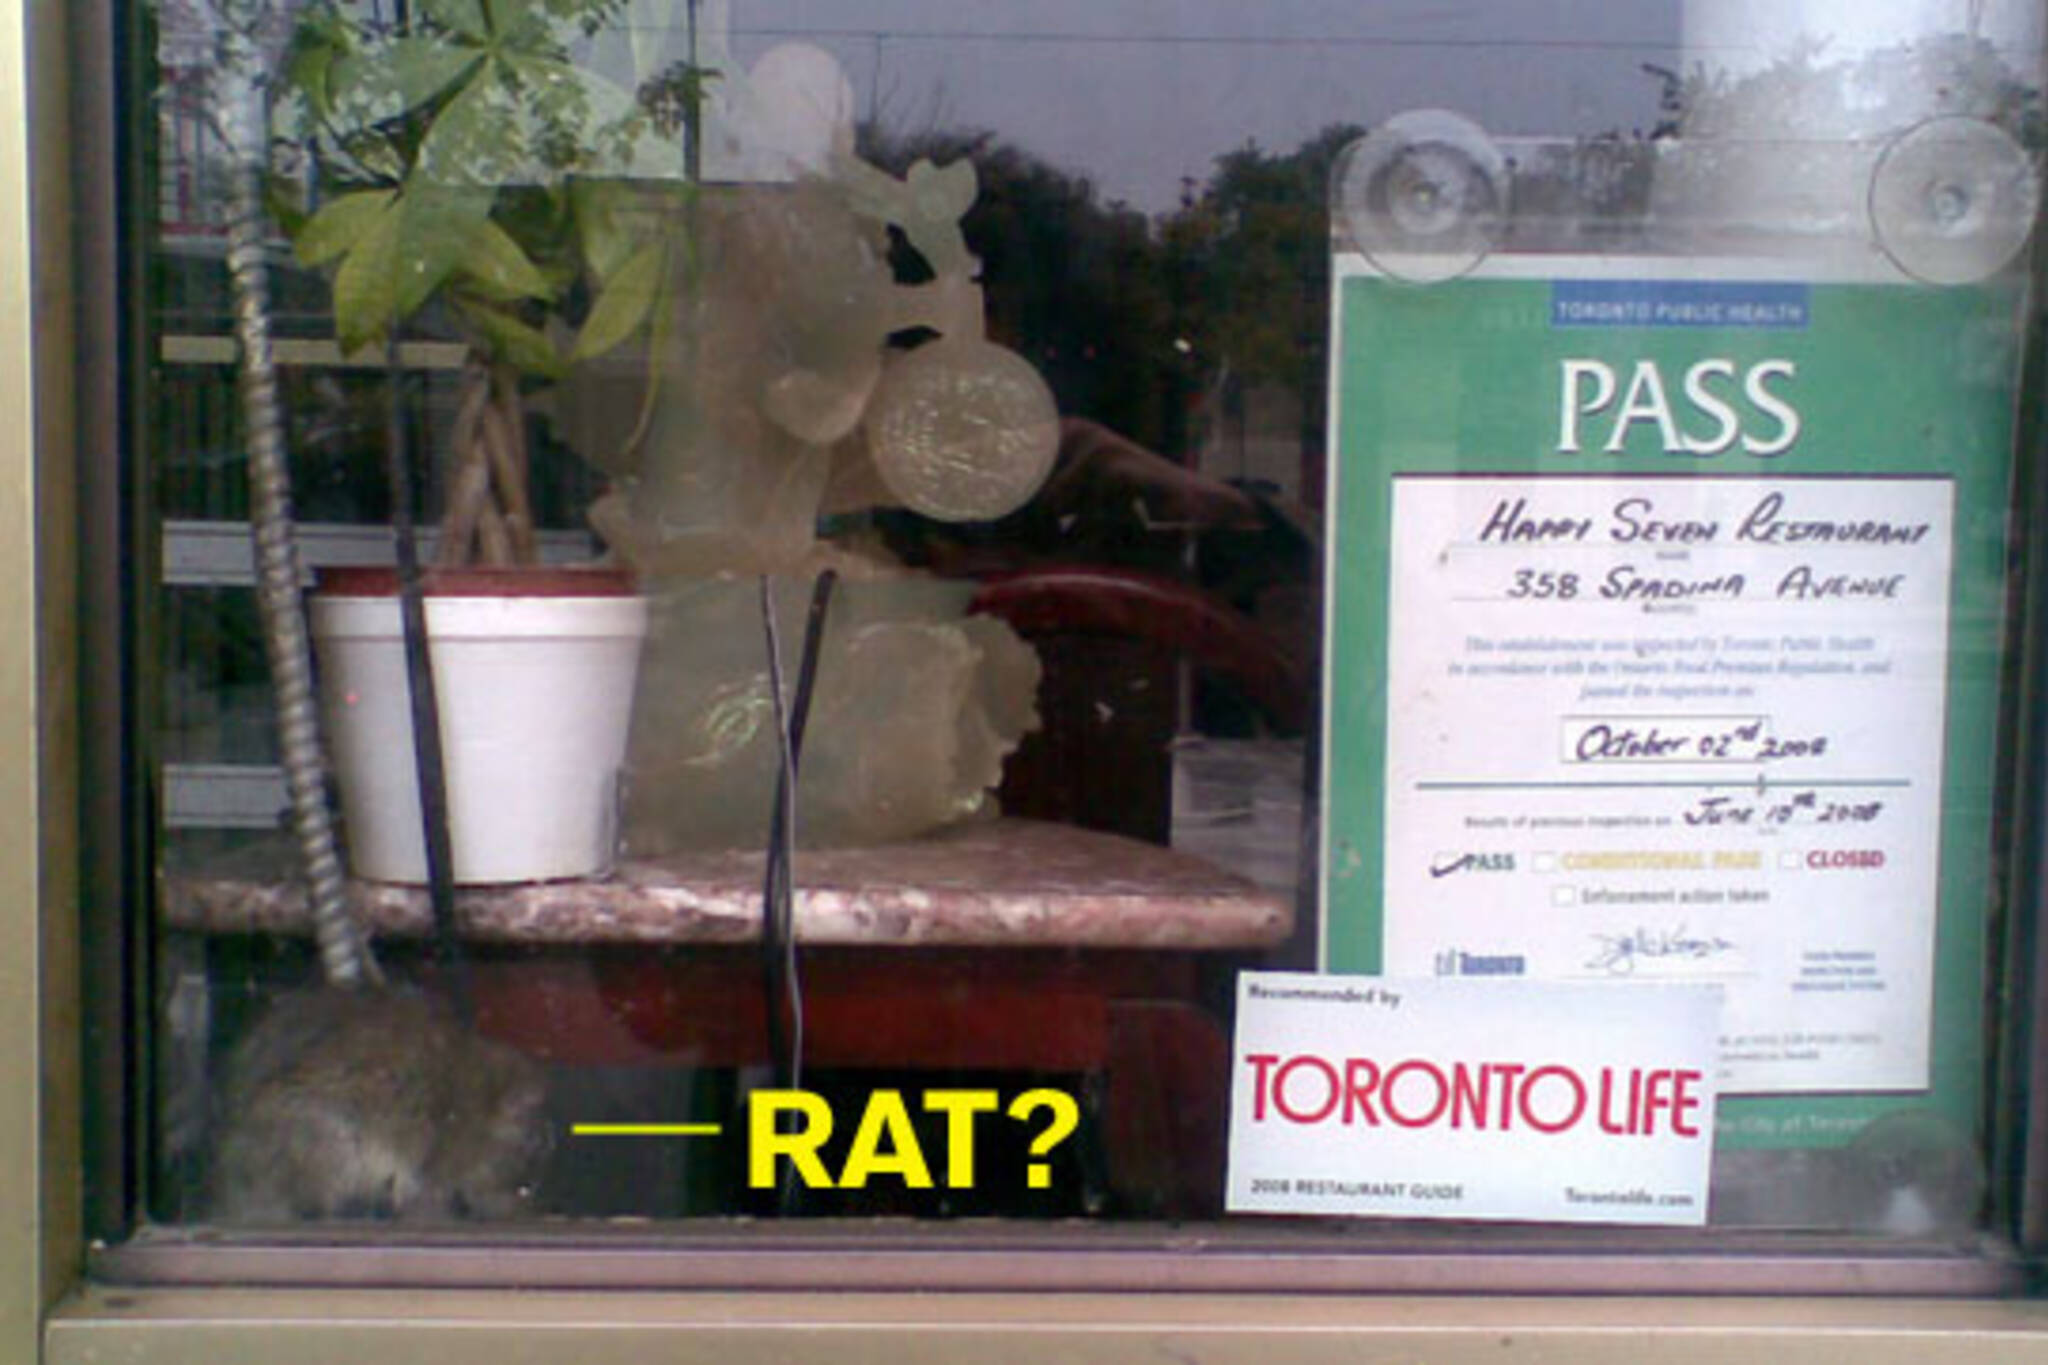 Rat Happy Seven